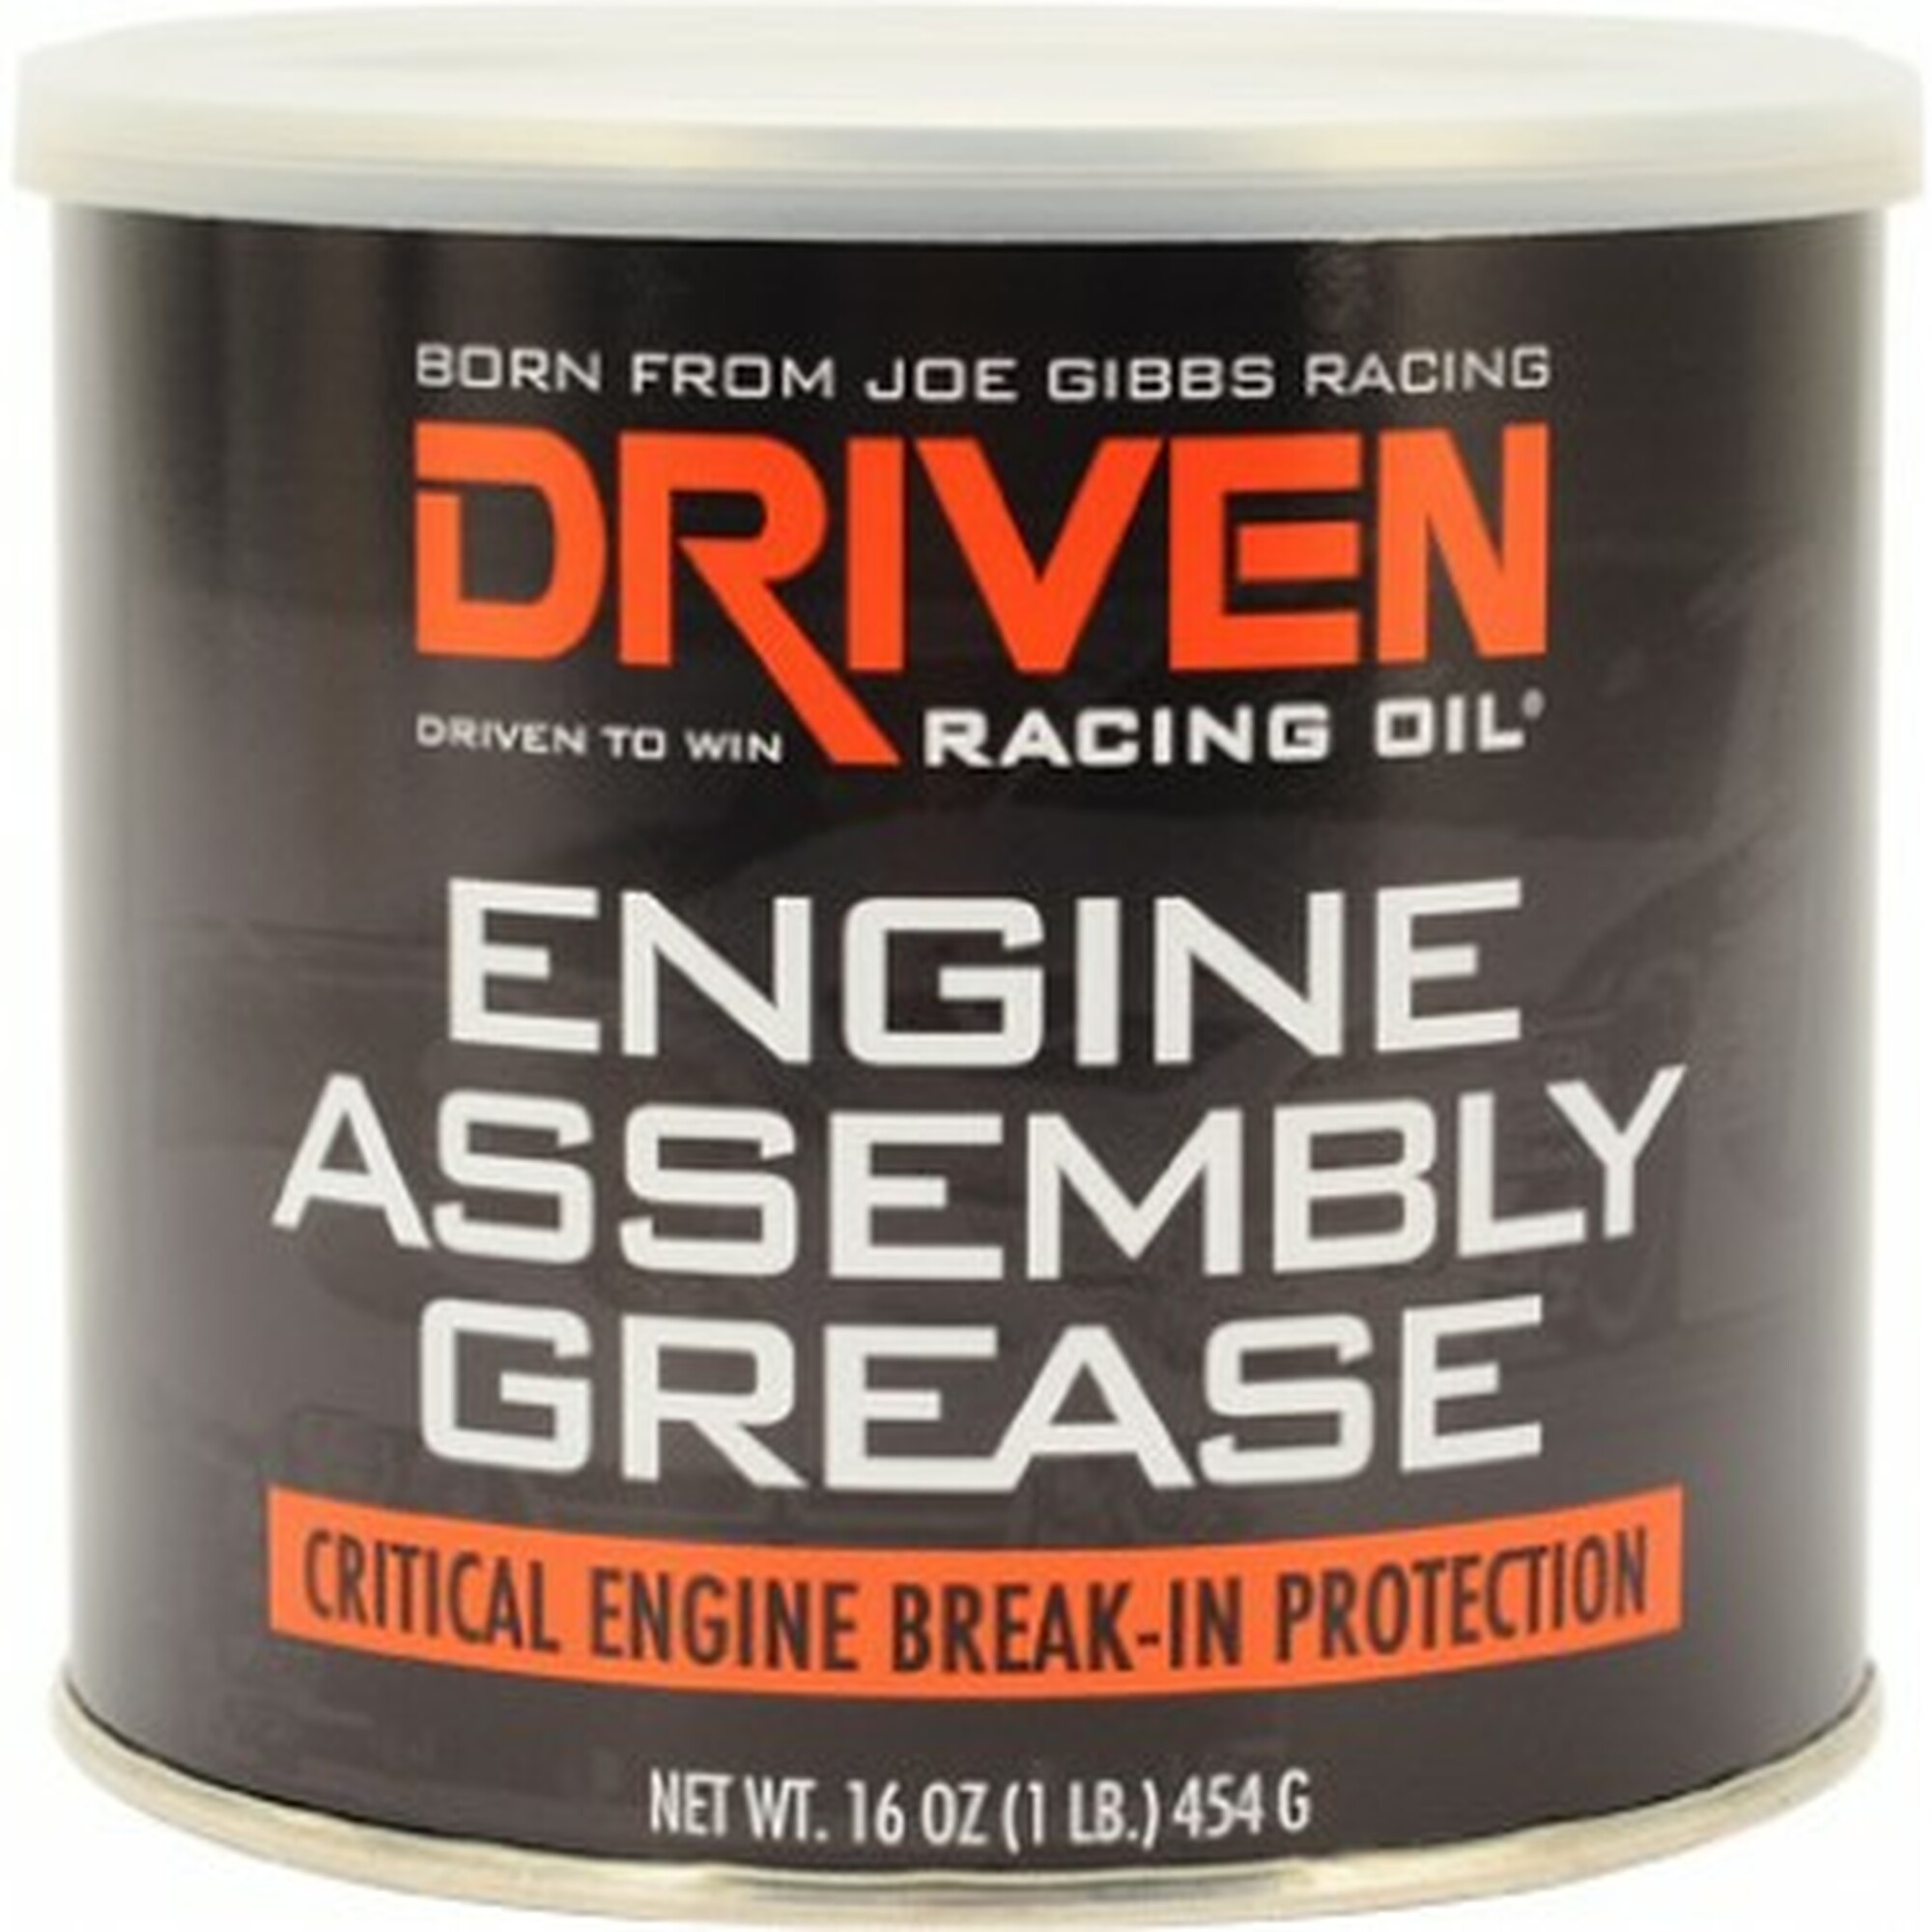 Joe Gibbs DRIVEN Engine Assembly Grease 1LB Tub, Part #JGR